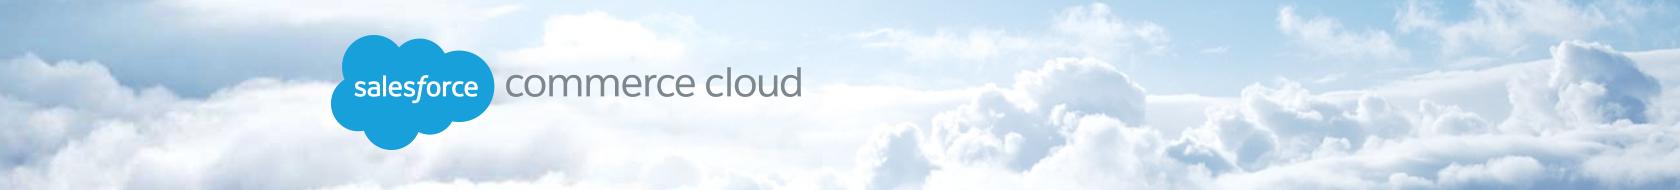 Salesforce_Commerce_Cloud_Header_1680x190